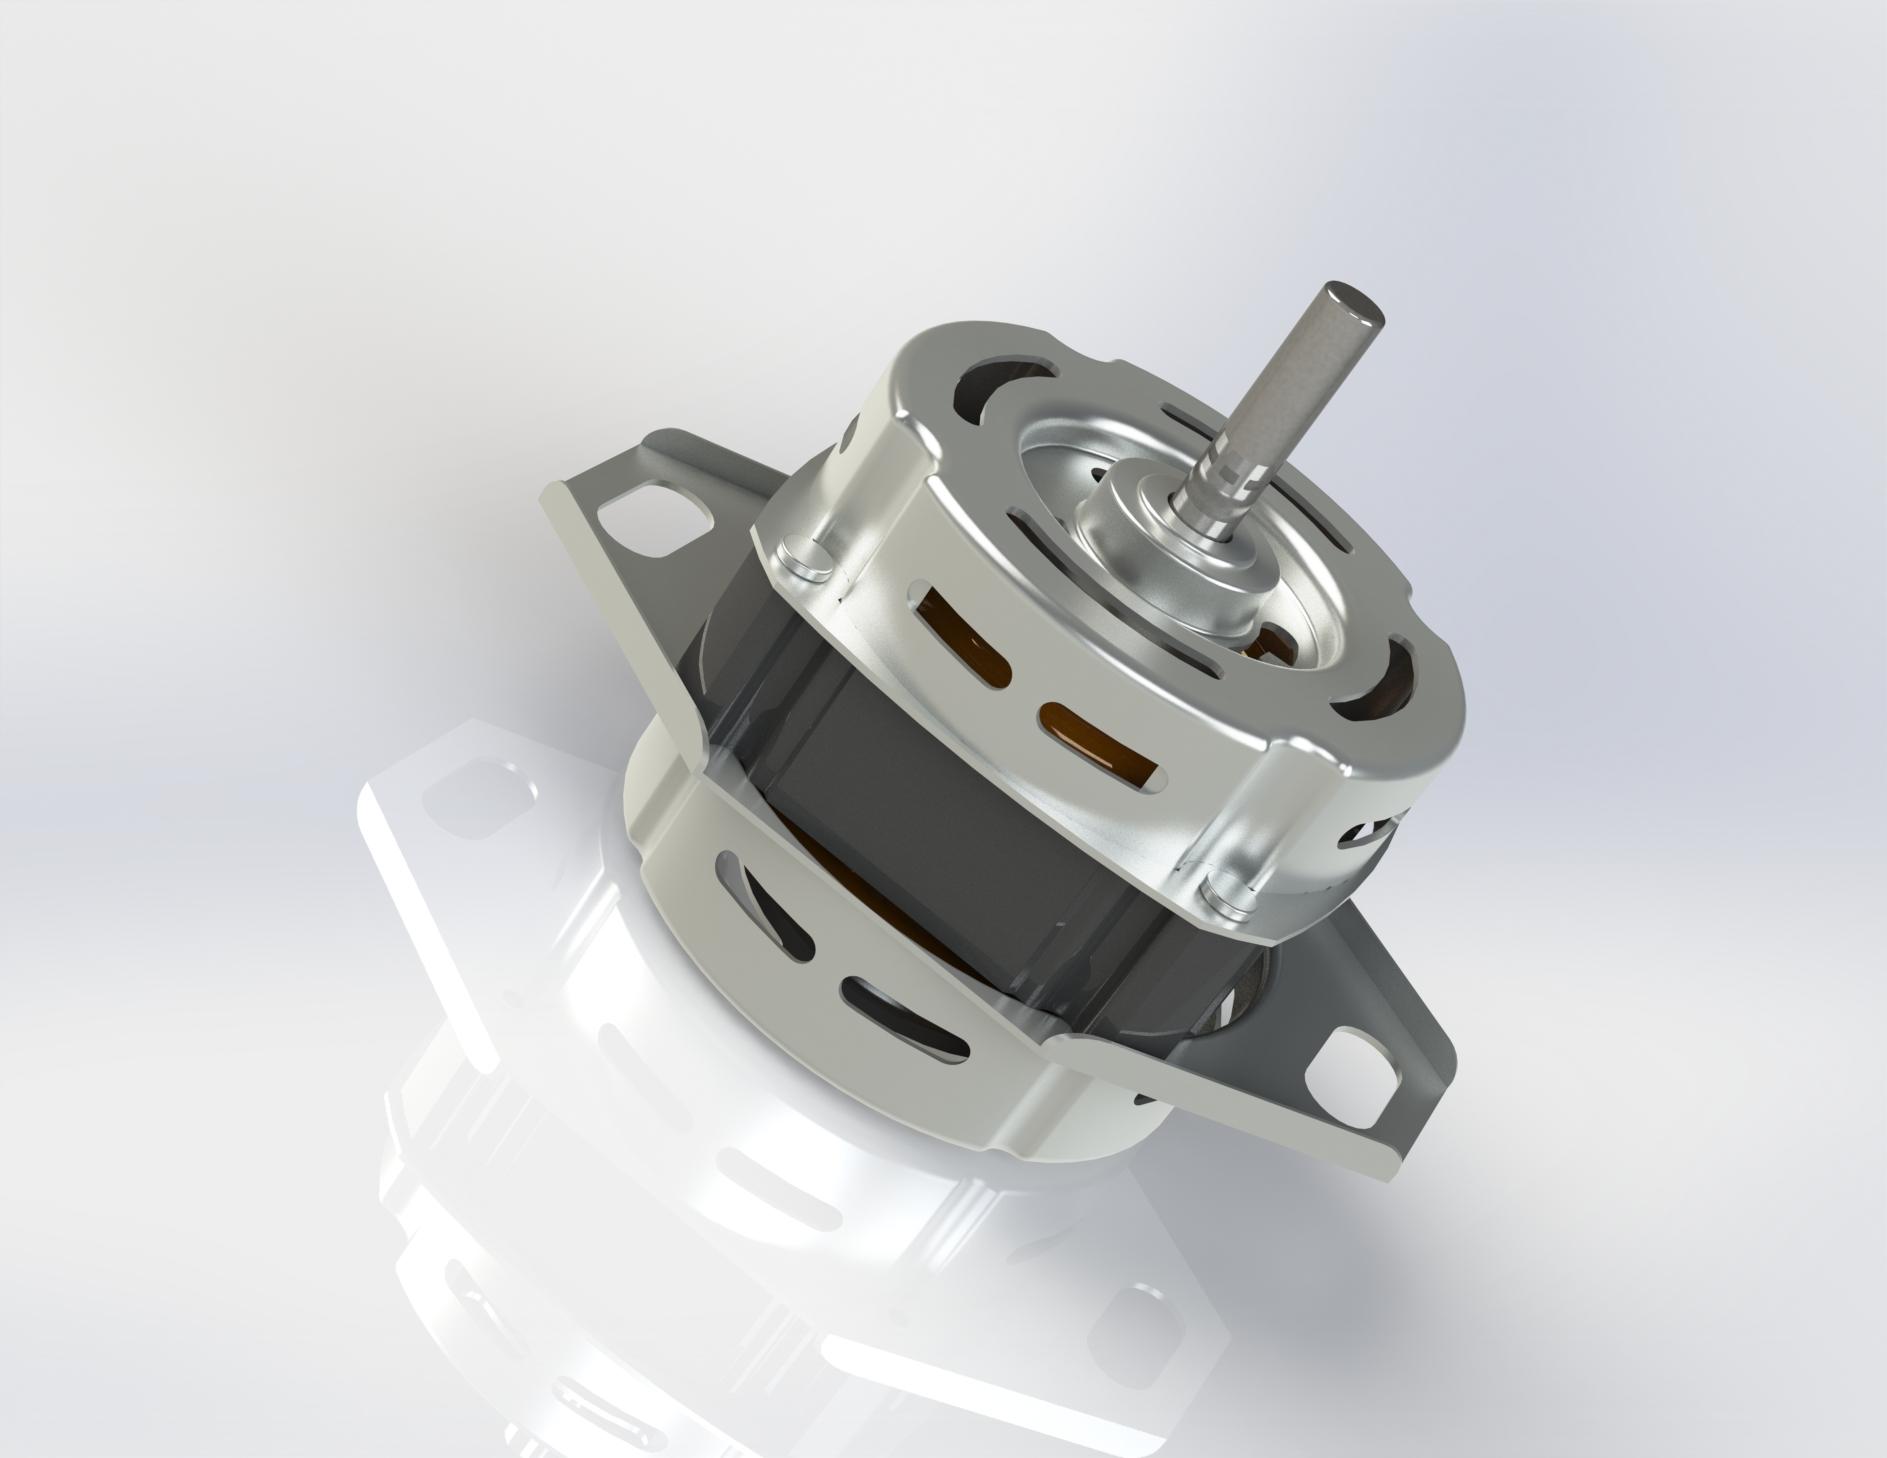 Washing machine motor_AC induction motor